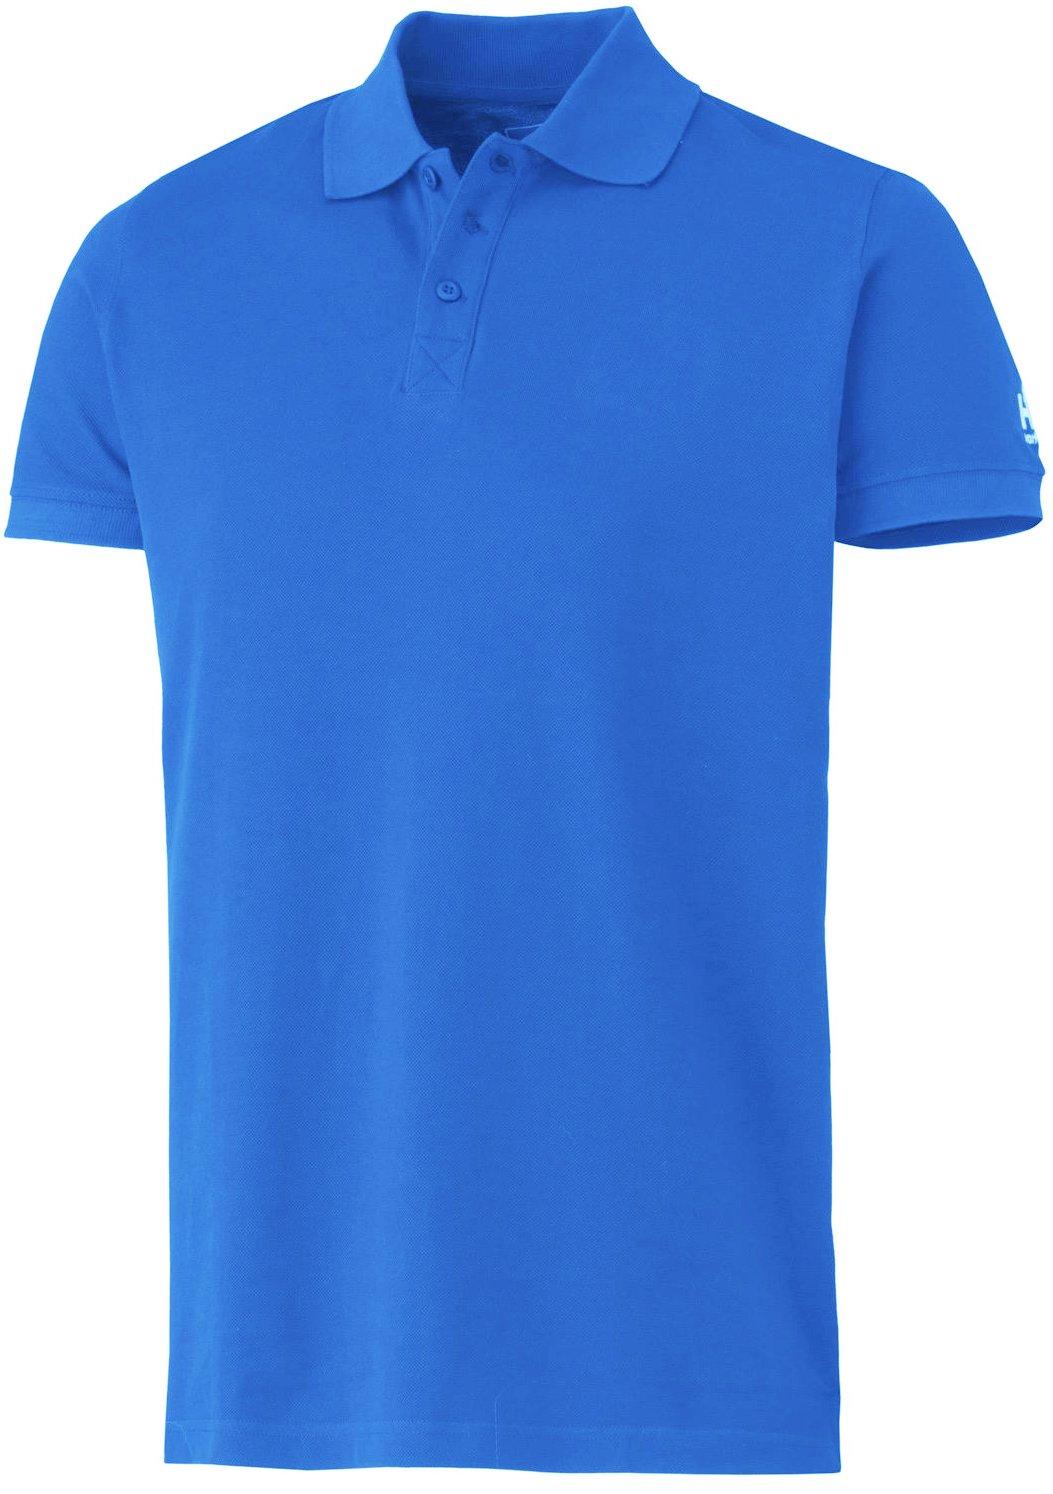 Helly Hansen Workwear Polo Shirt Salford Pique 79182, 34-079182-900-XL 79182_900-XL